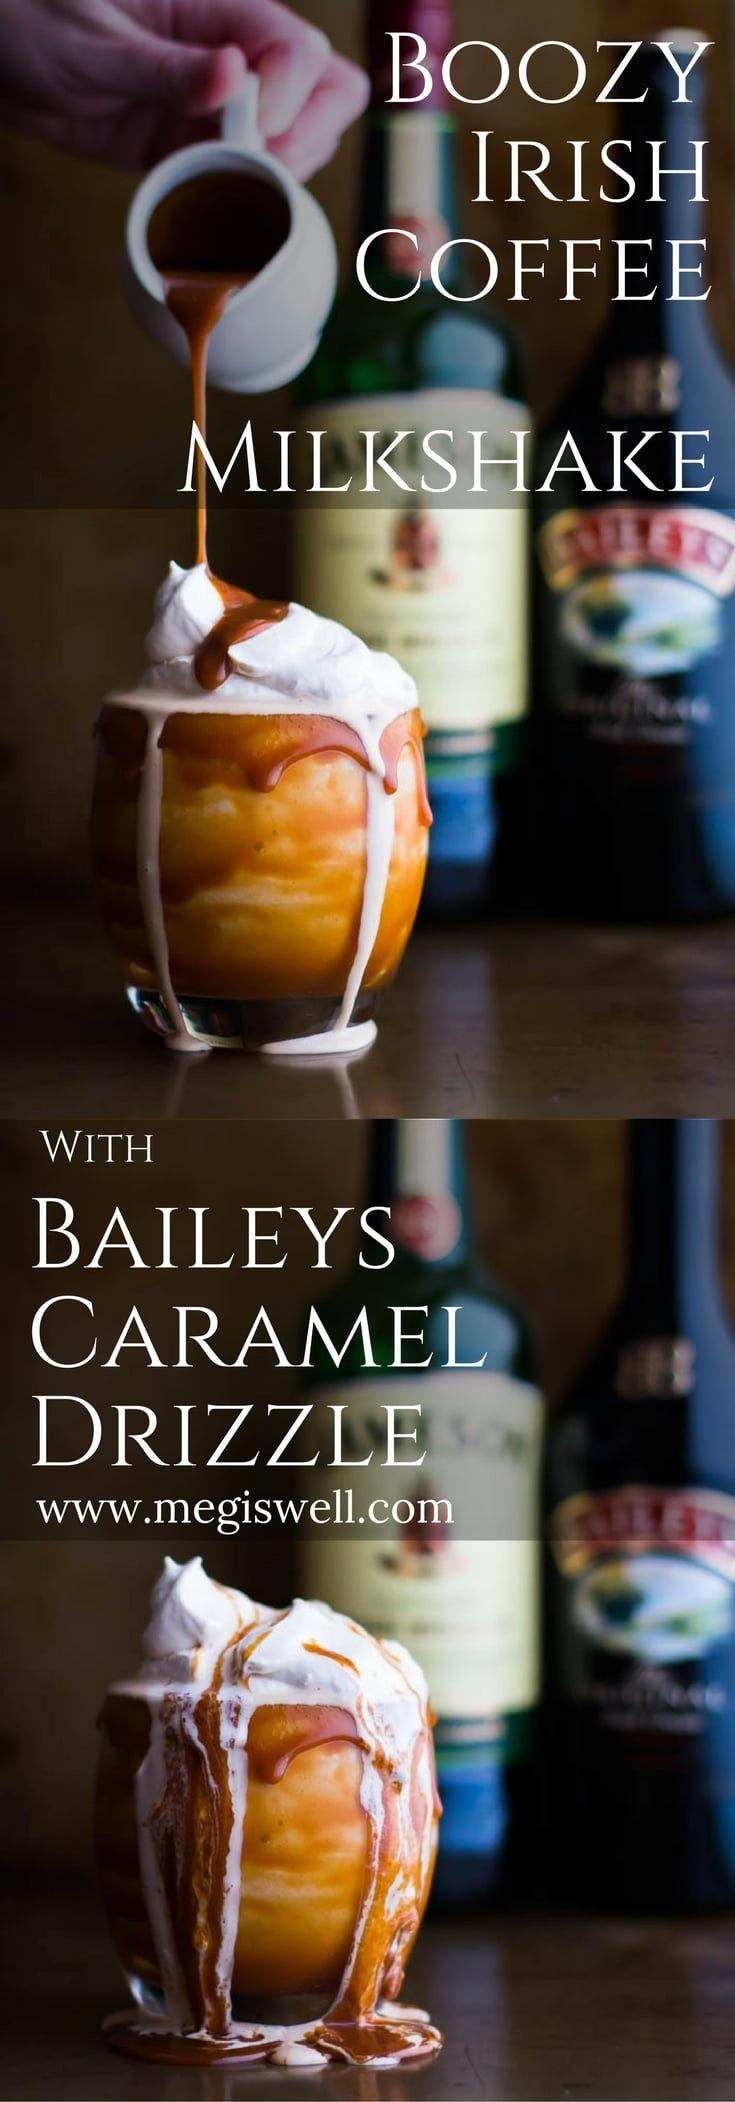 Boozy Irish Coffee Milkshake with Baileys Caramel Drizzle